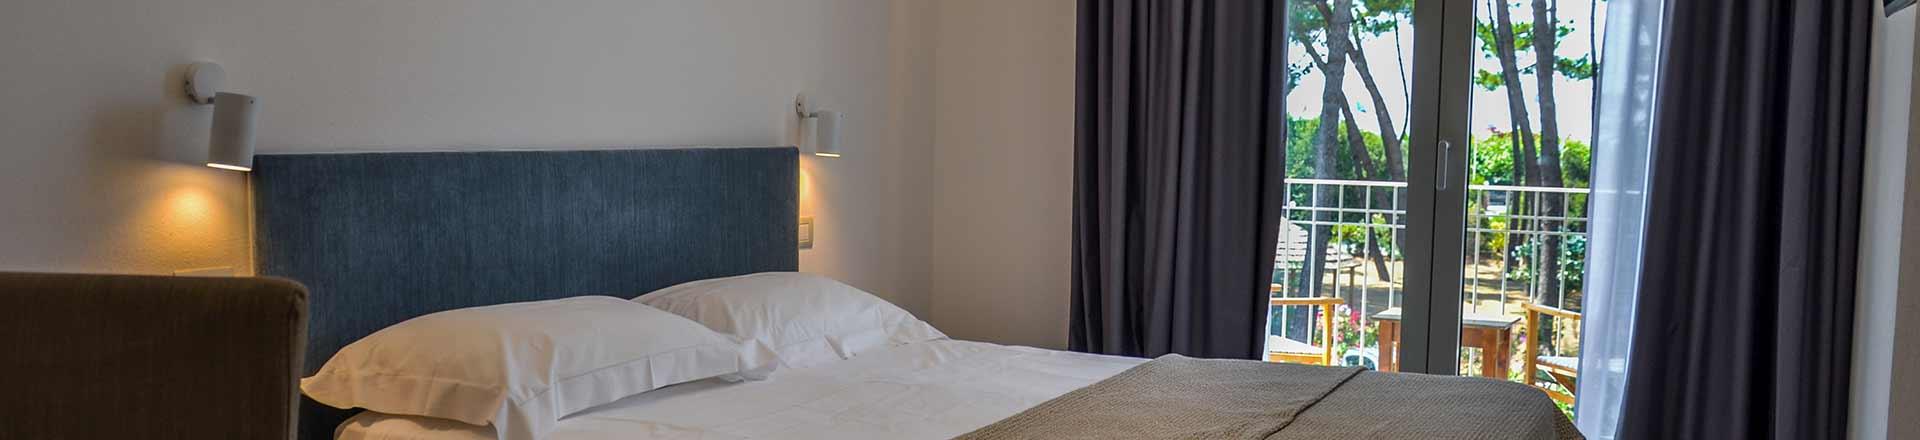 Hotel e Camere ristrutturate nel 2017 a Ronchi